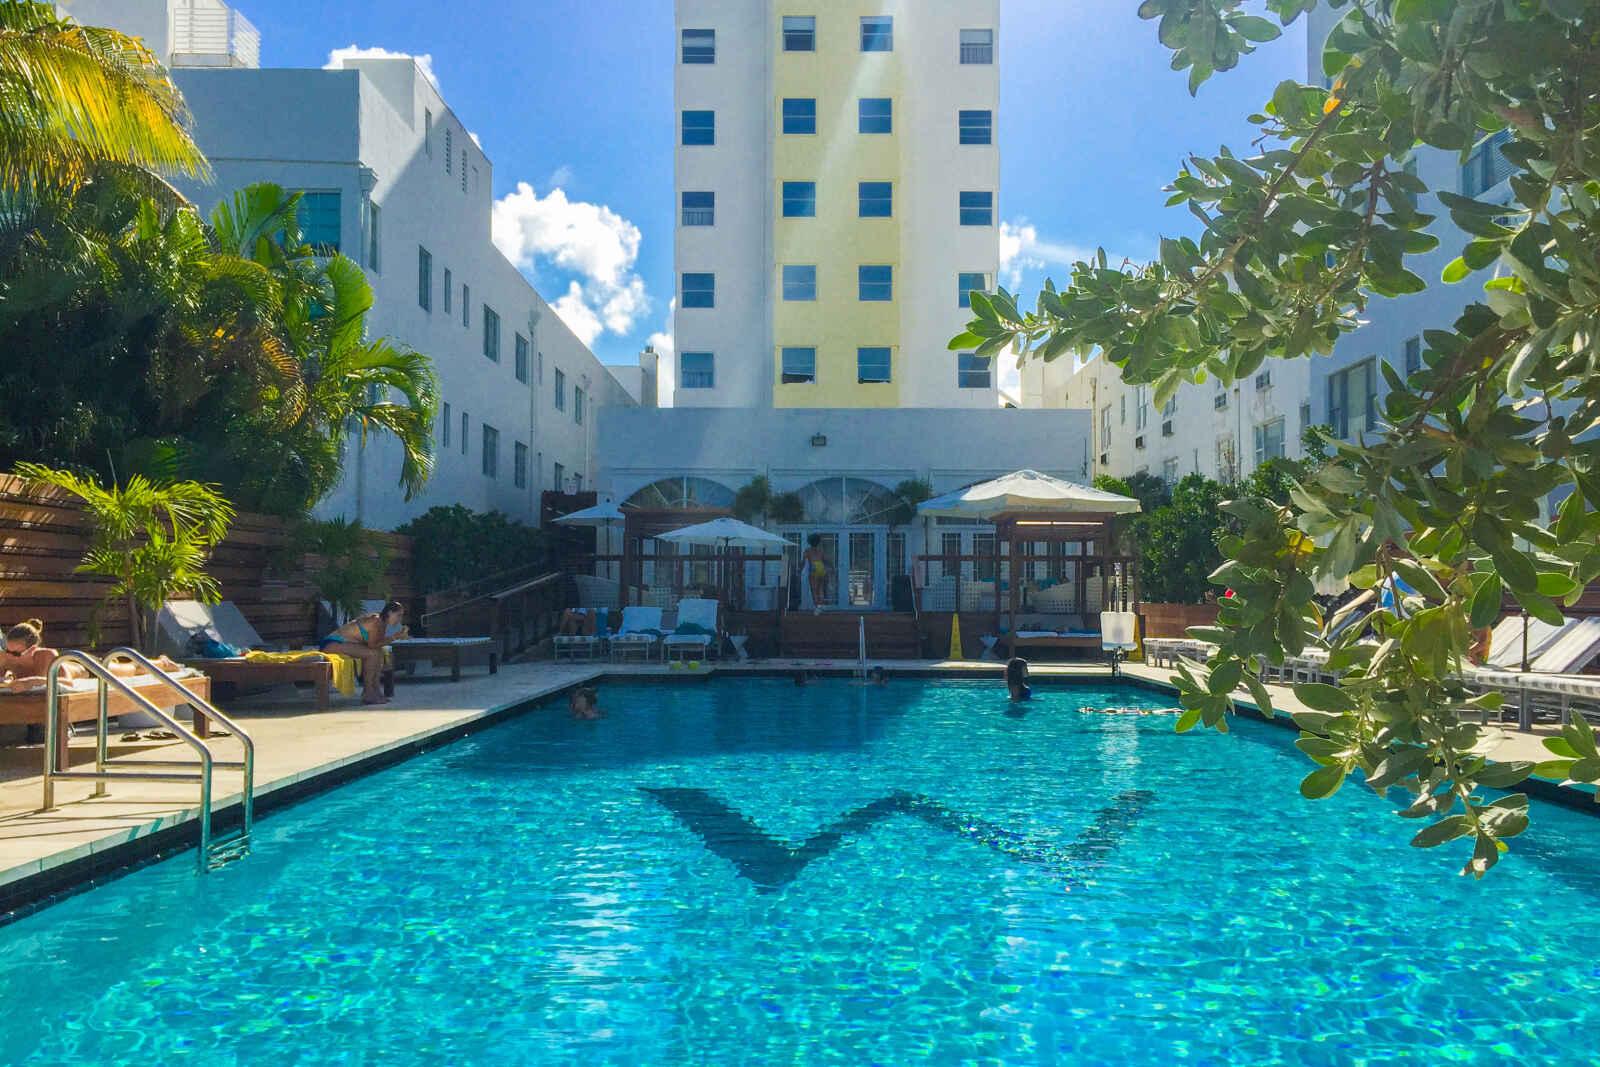 Séjour Etats-Unis - Marseilles Hotel Miami - 3.5*